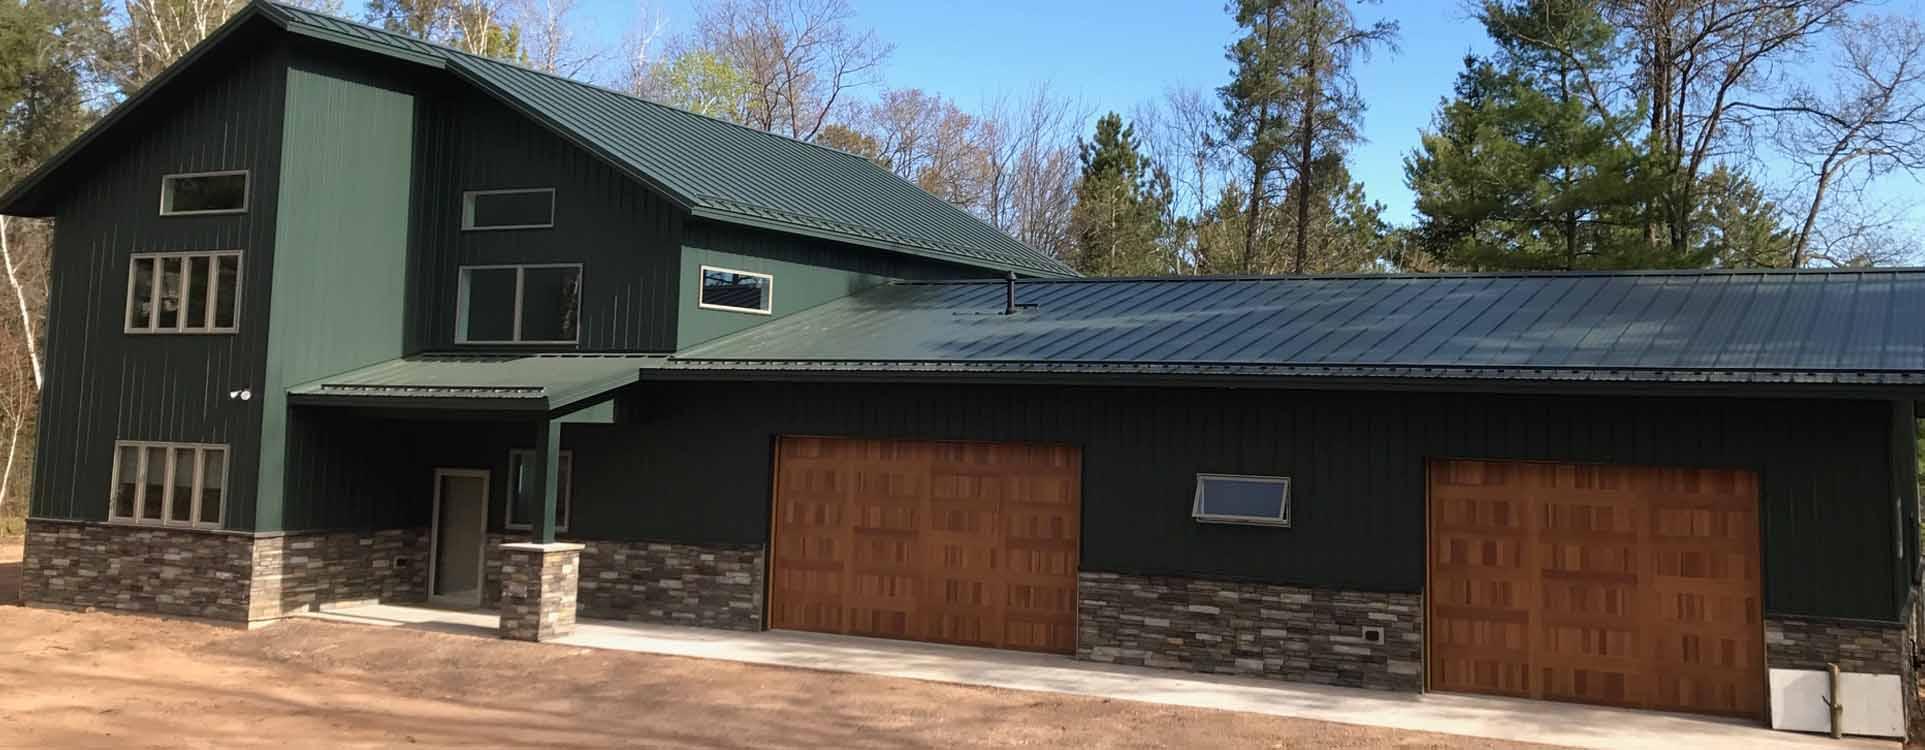 Hayward wisconsin home builders northwest wisconsin for Residential home builder